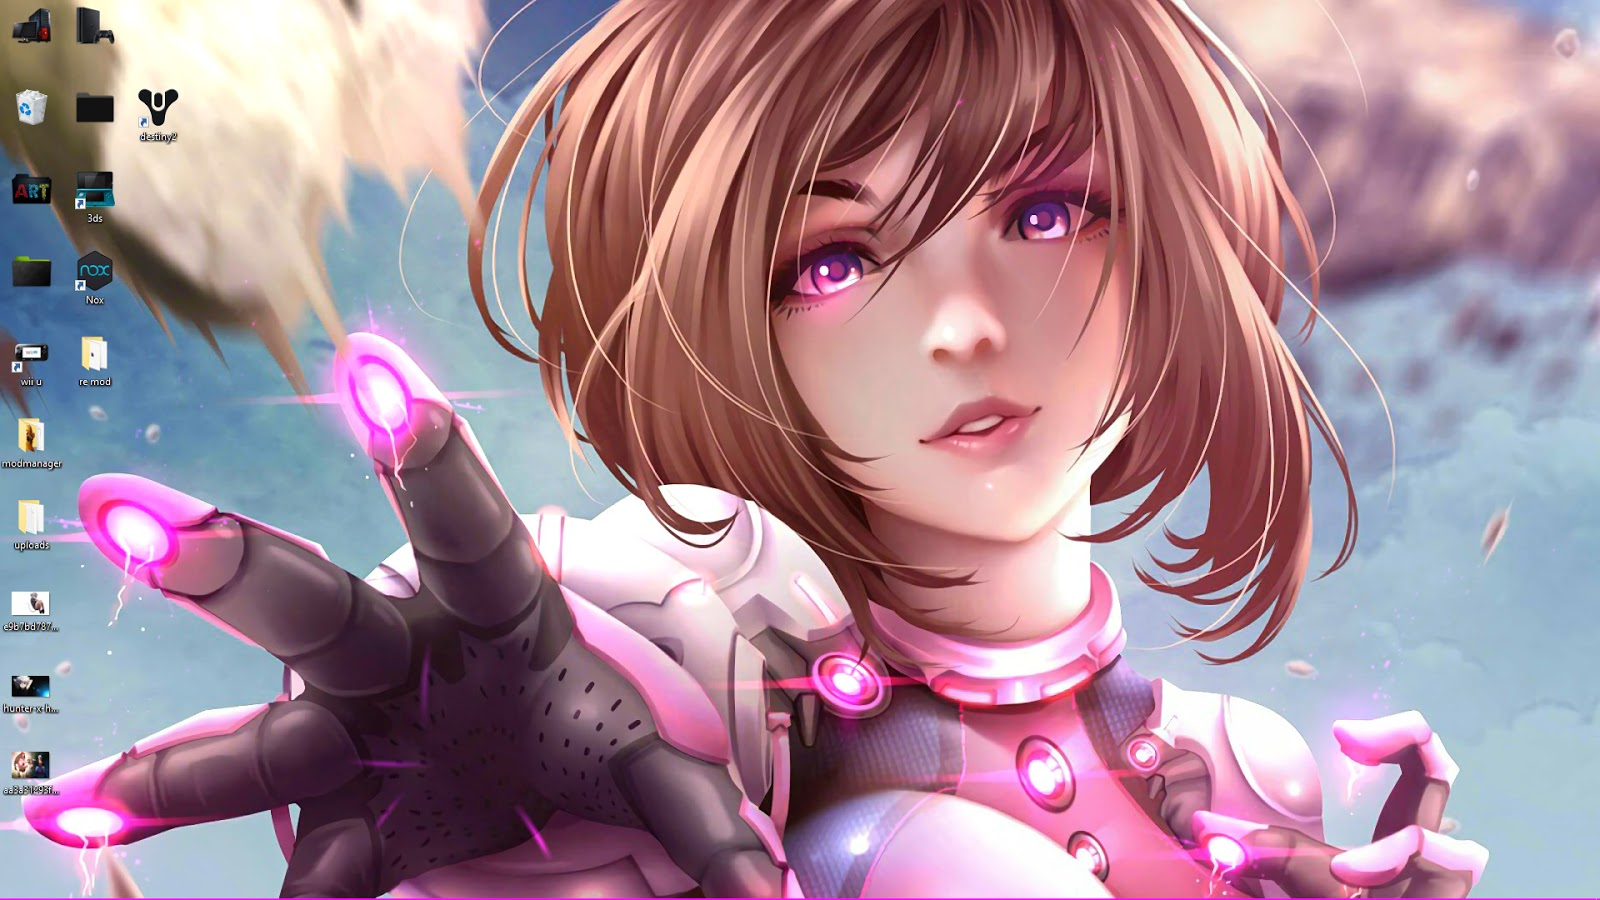 anime girl Ochako Uraraka live wallpaper free download ...